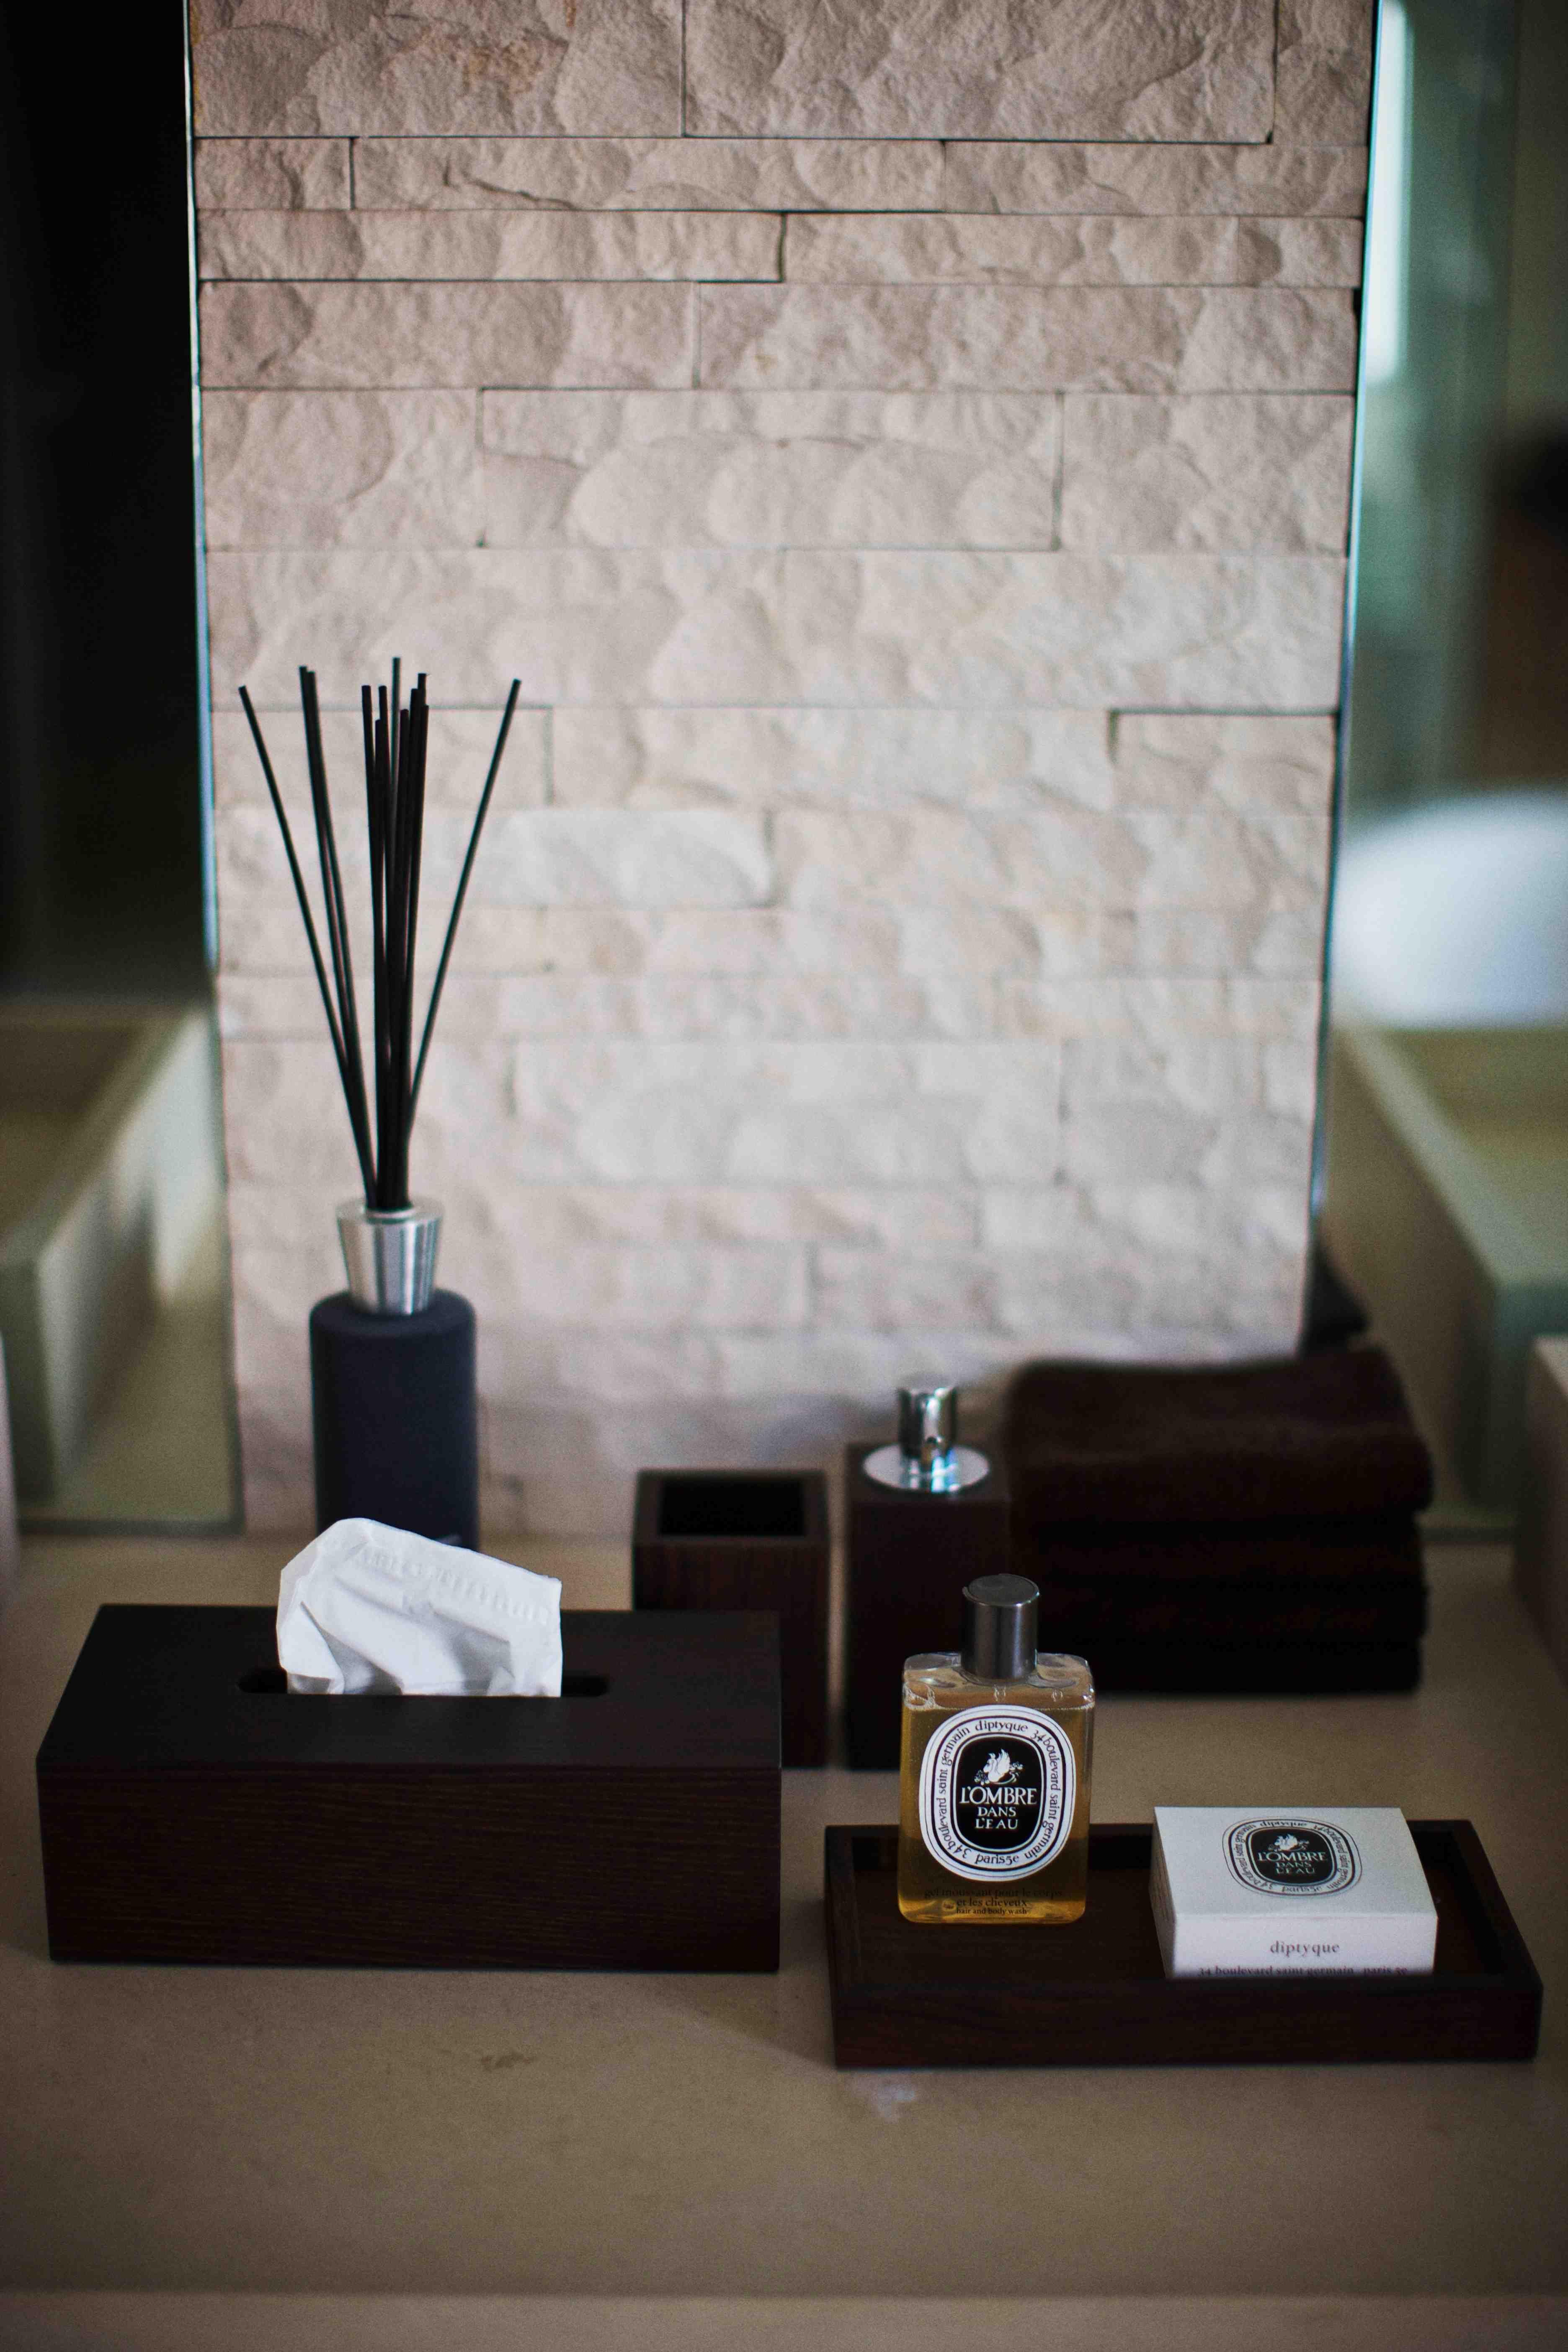 matt black bathroom accessories and fabulous pale white stone tiles ...